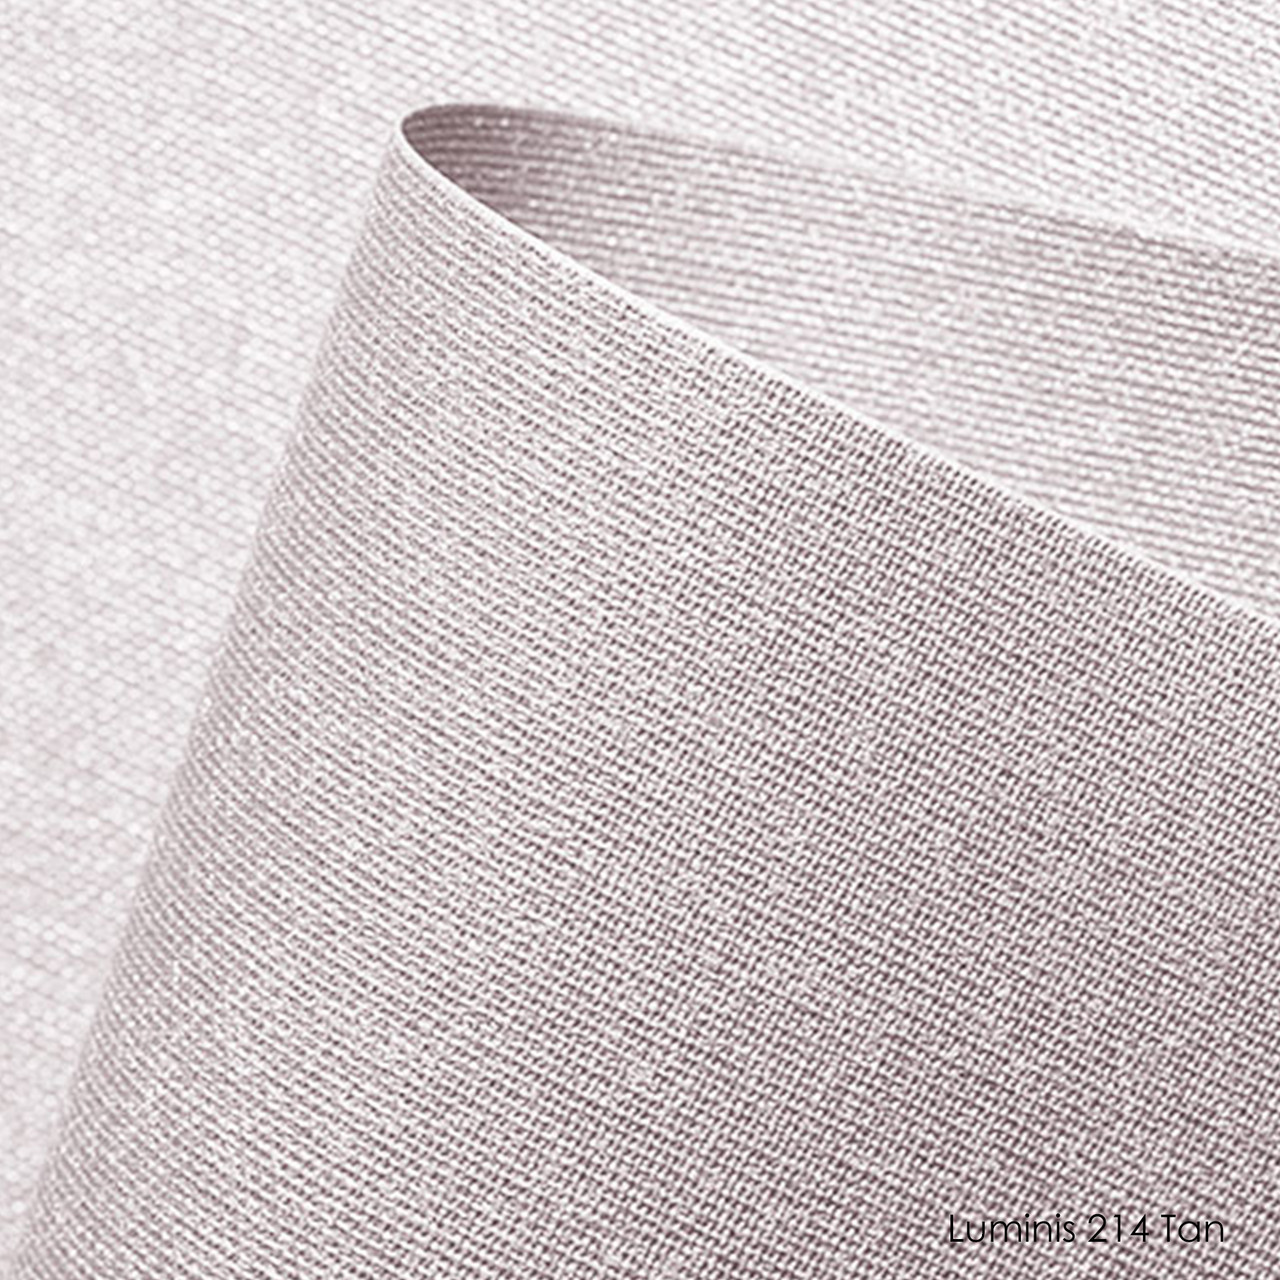 Ролеты тканевые Luminis-214 tan